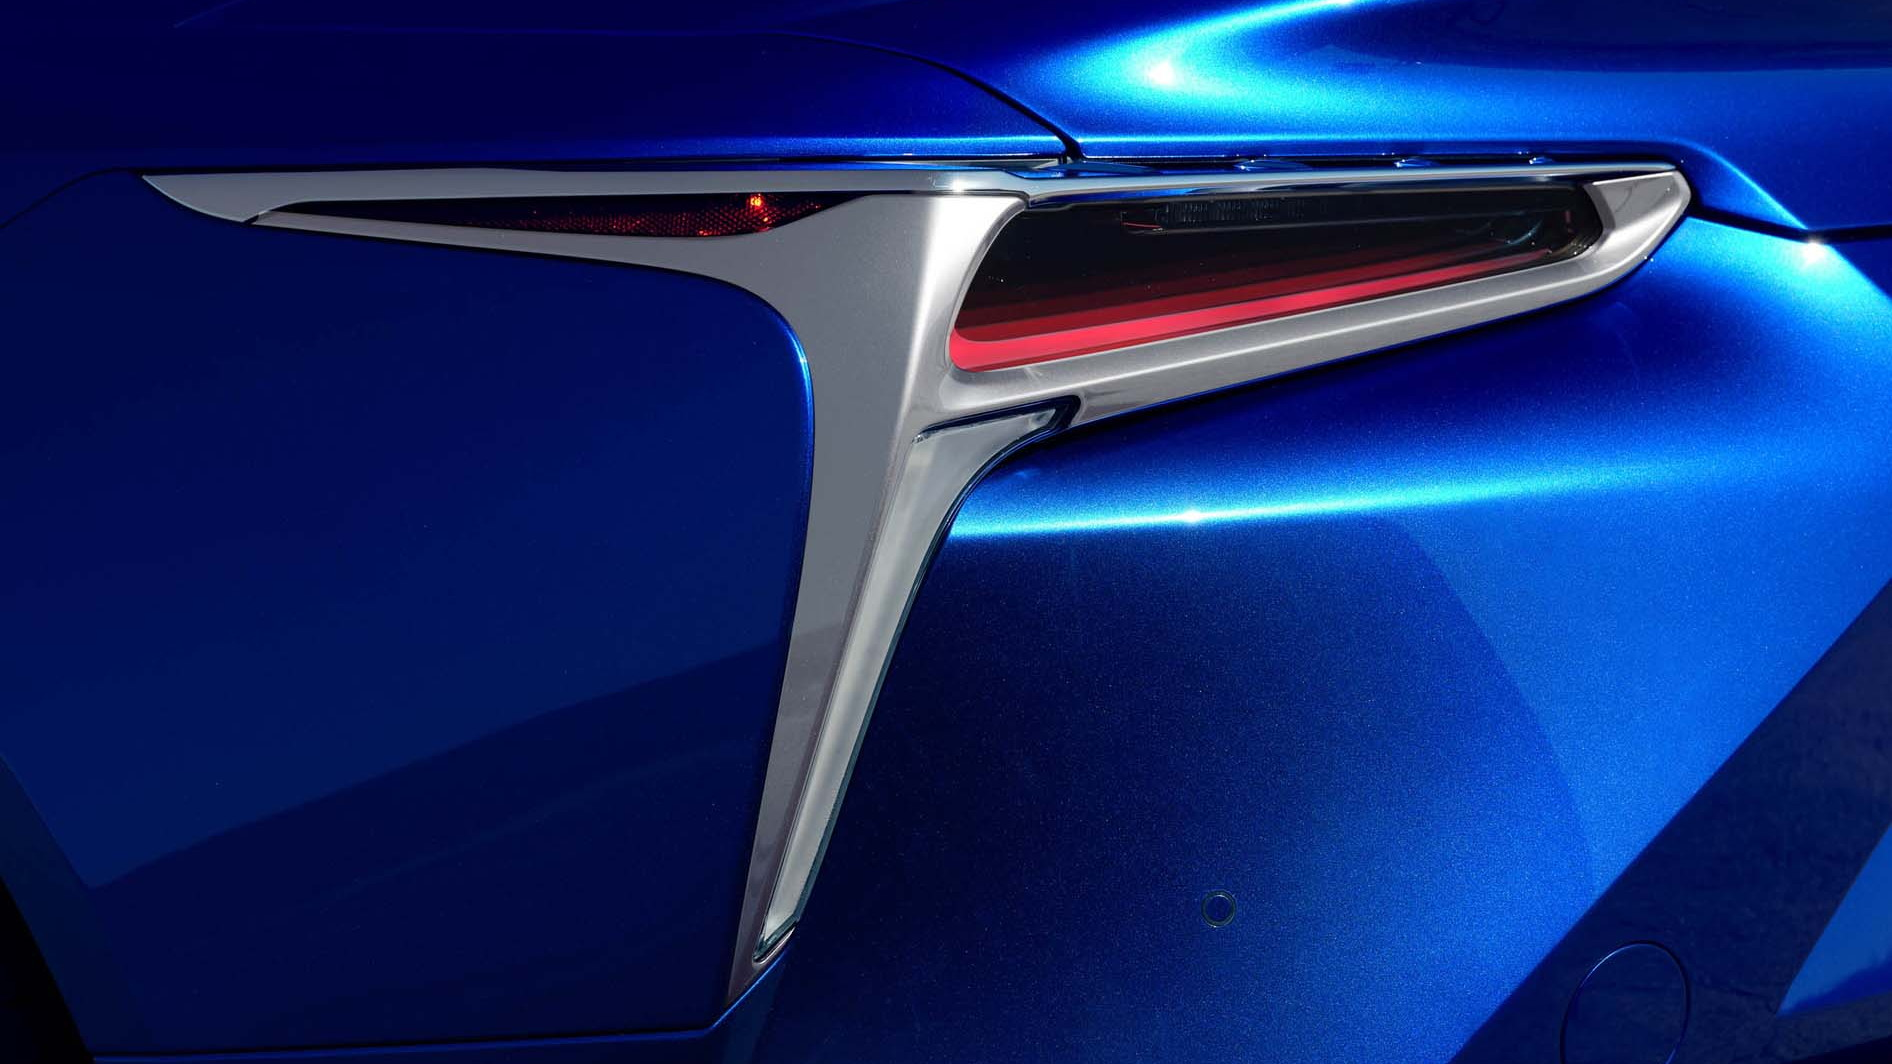 2021 Lexus LC Inspiration Series Launch Exclusive 1 of 1